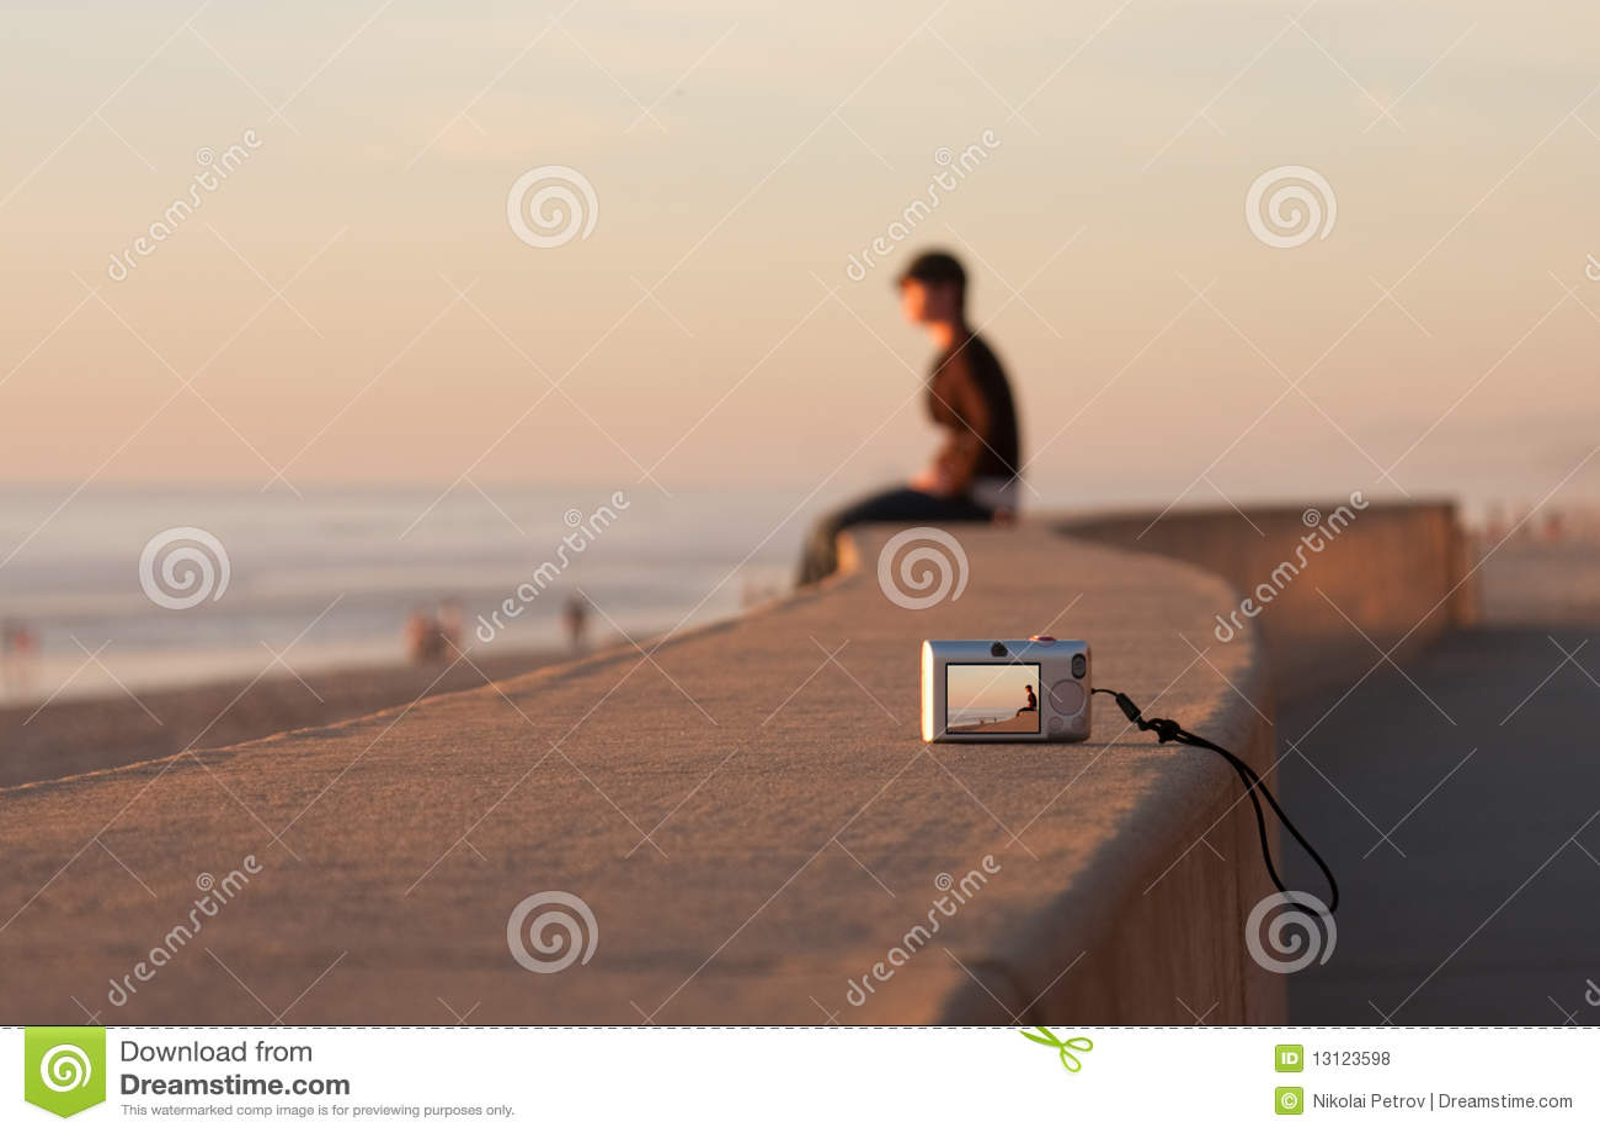 Man Sitting Alone Sunset Beach And Camera Stock Photo - Image ...